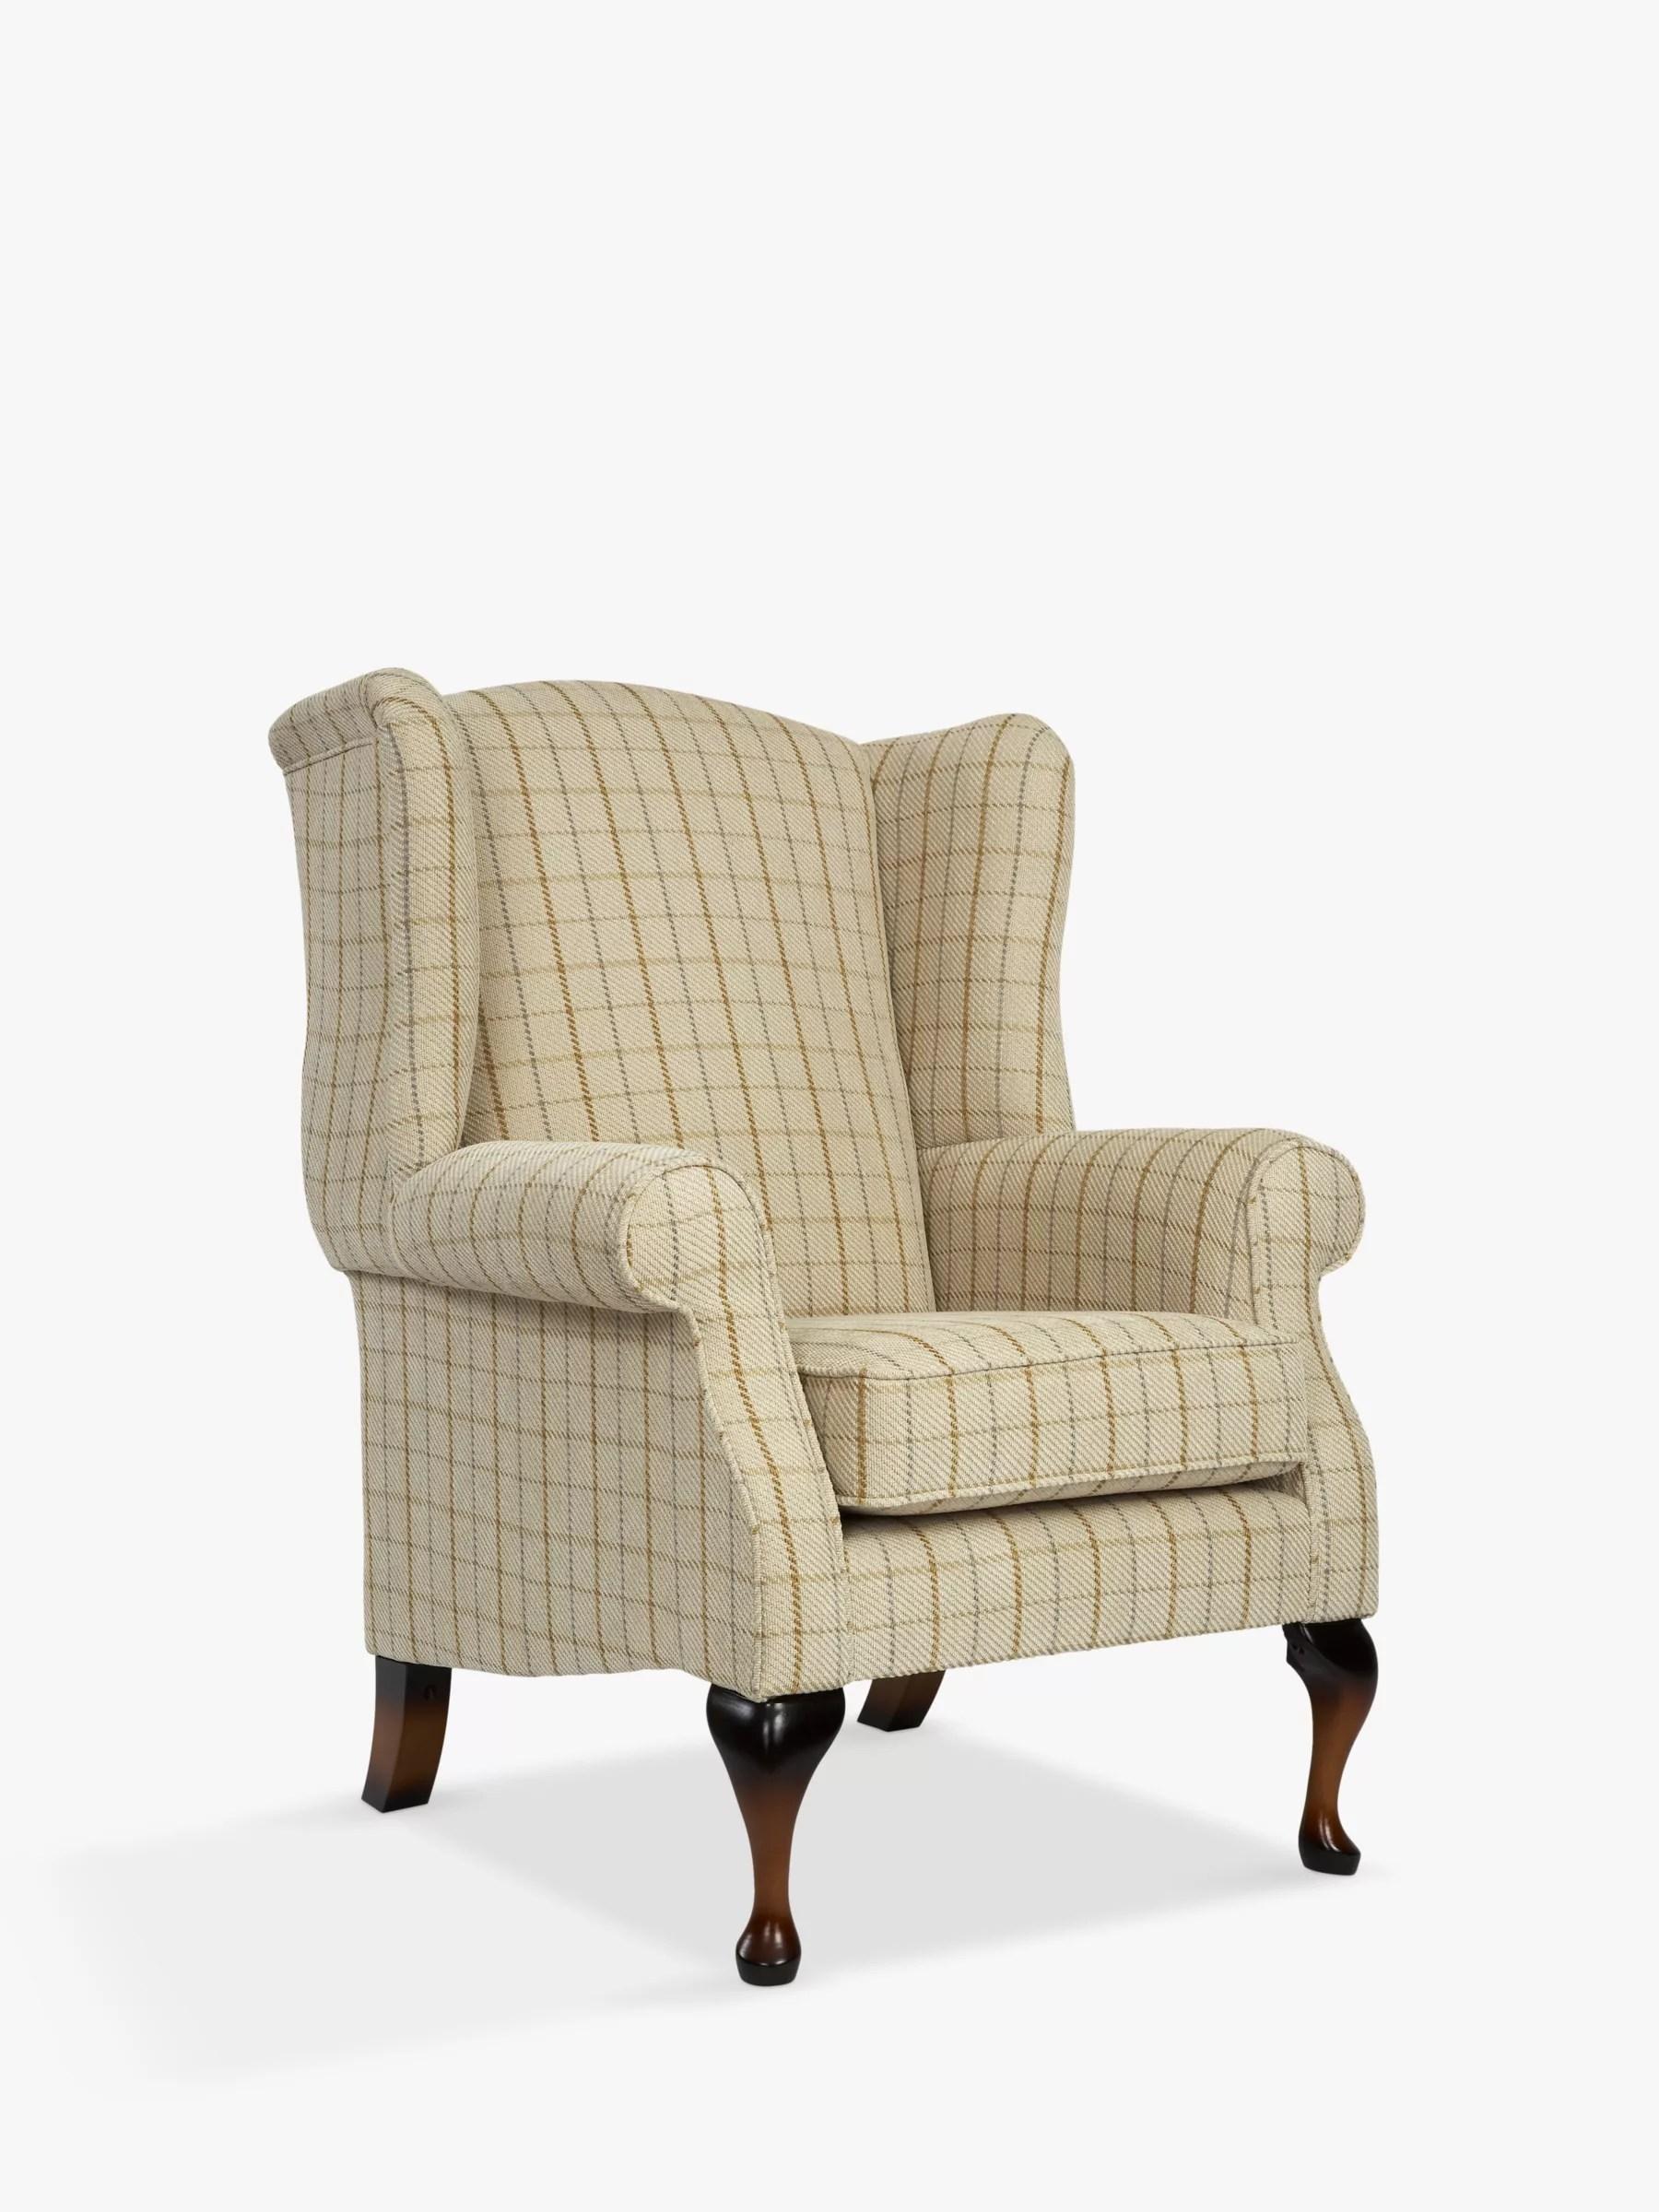 john lewis armchair covers bobo chair babies parker knoll oberon sandringham check at